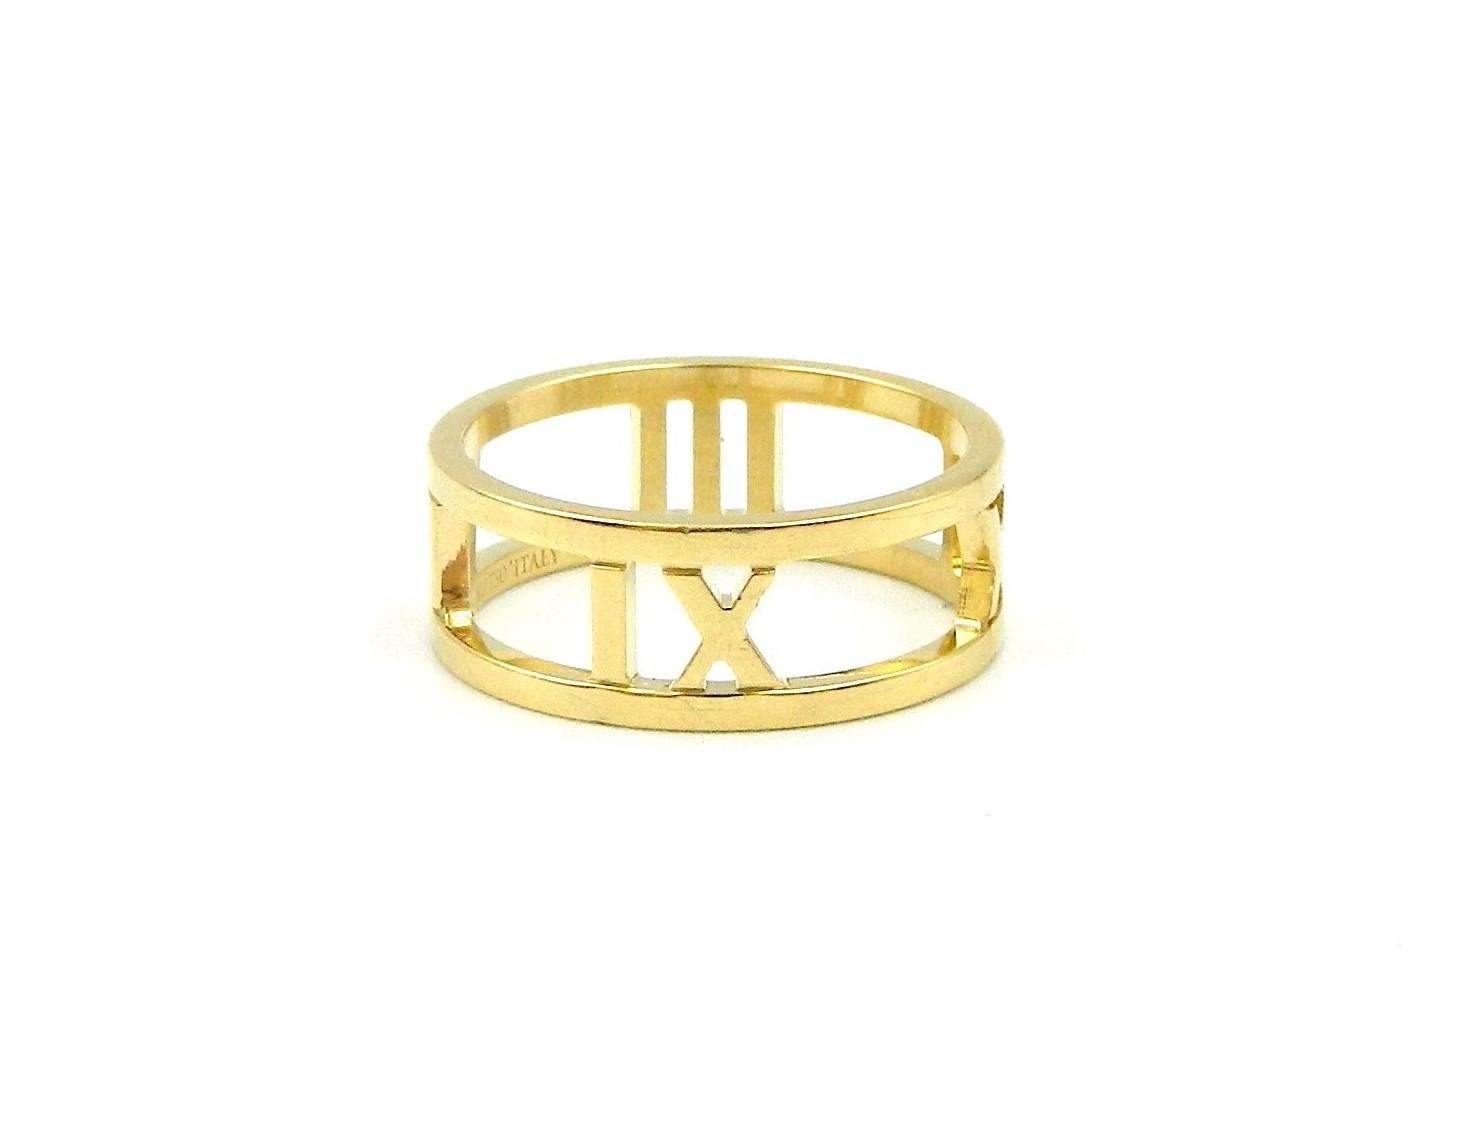 Estate Piece - Tiffany's Yellow Gold Atlas Ring